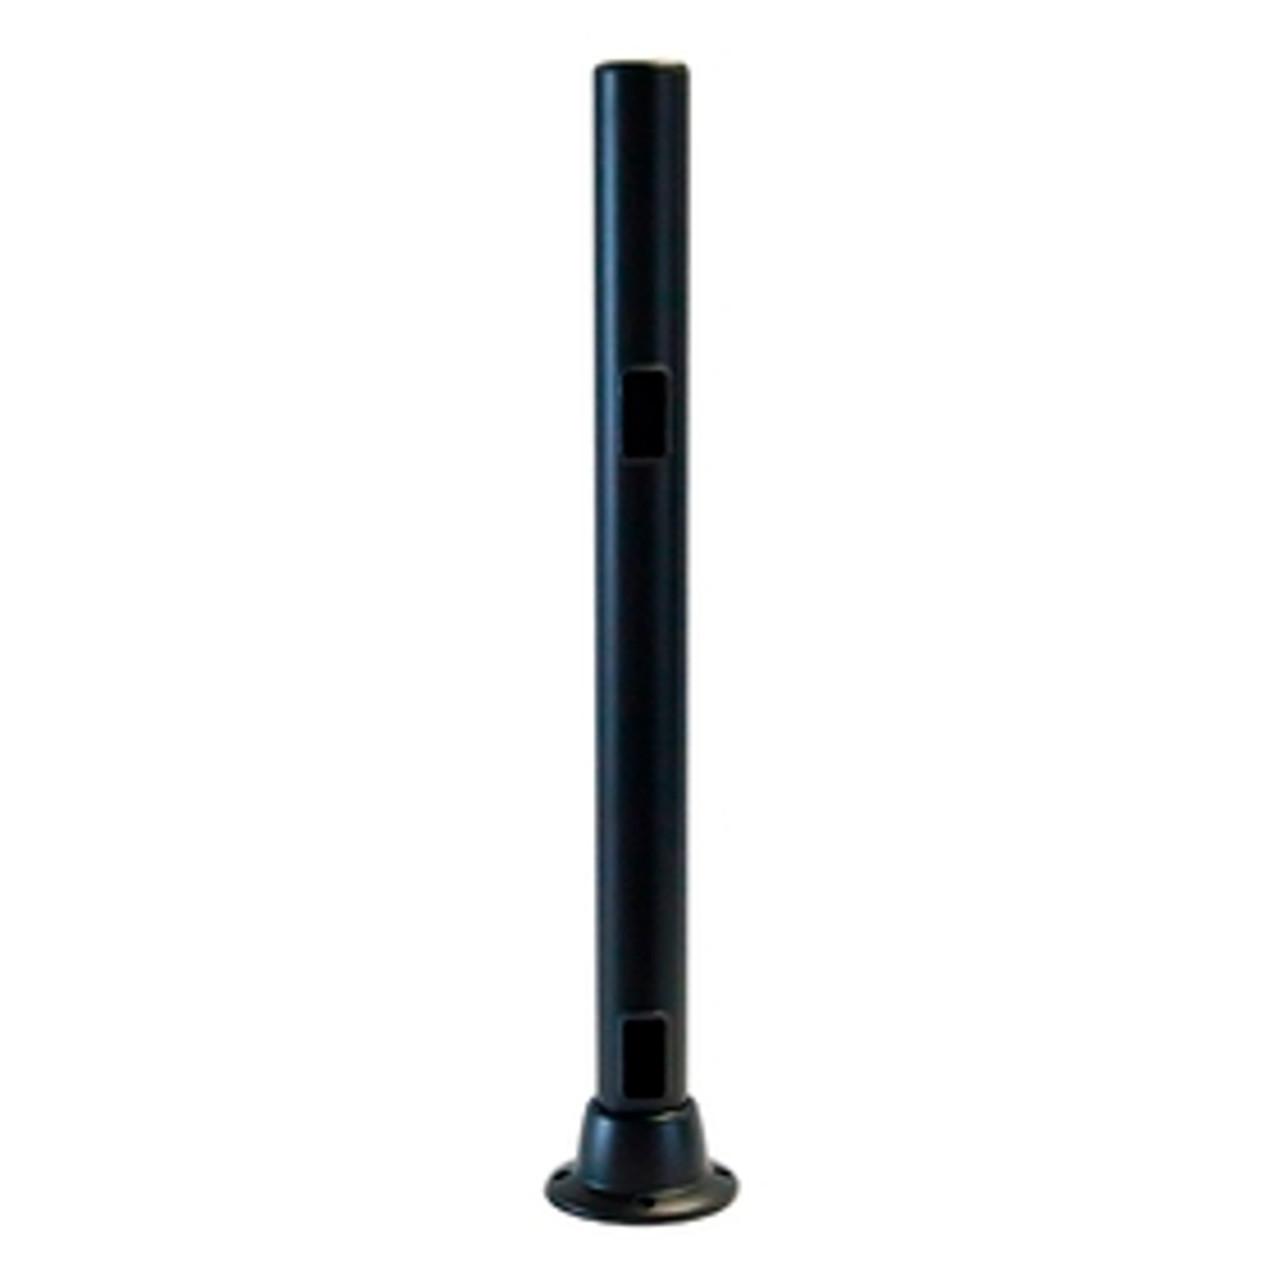 POS Grommet Mount Base 24 inch Pole